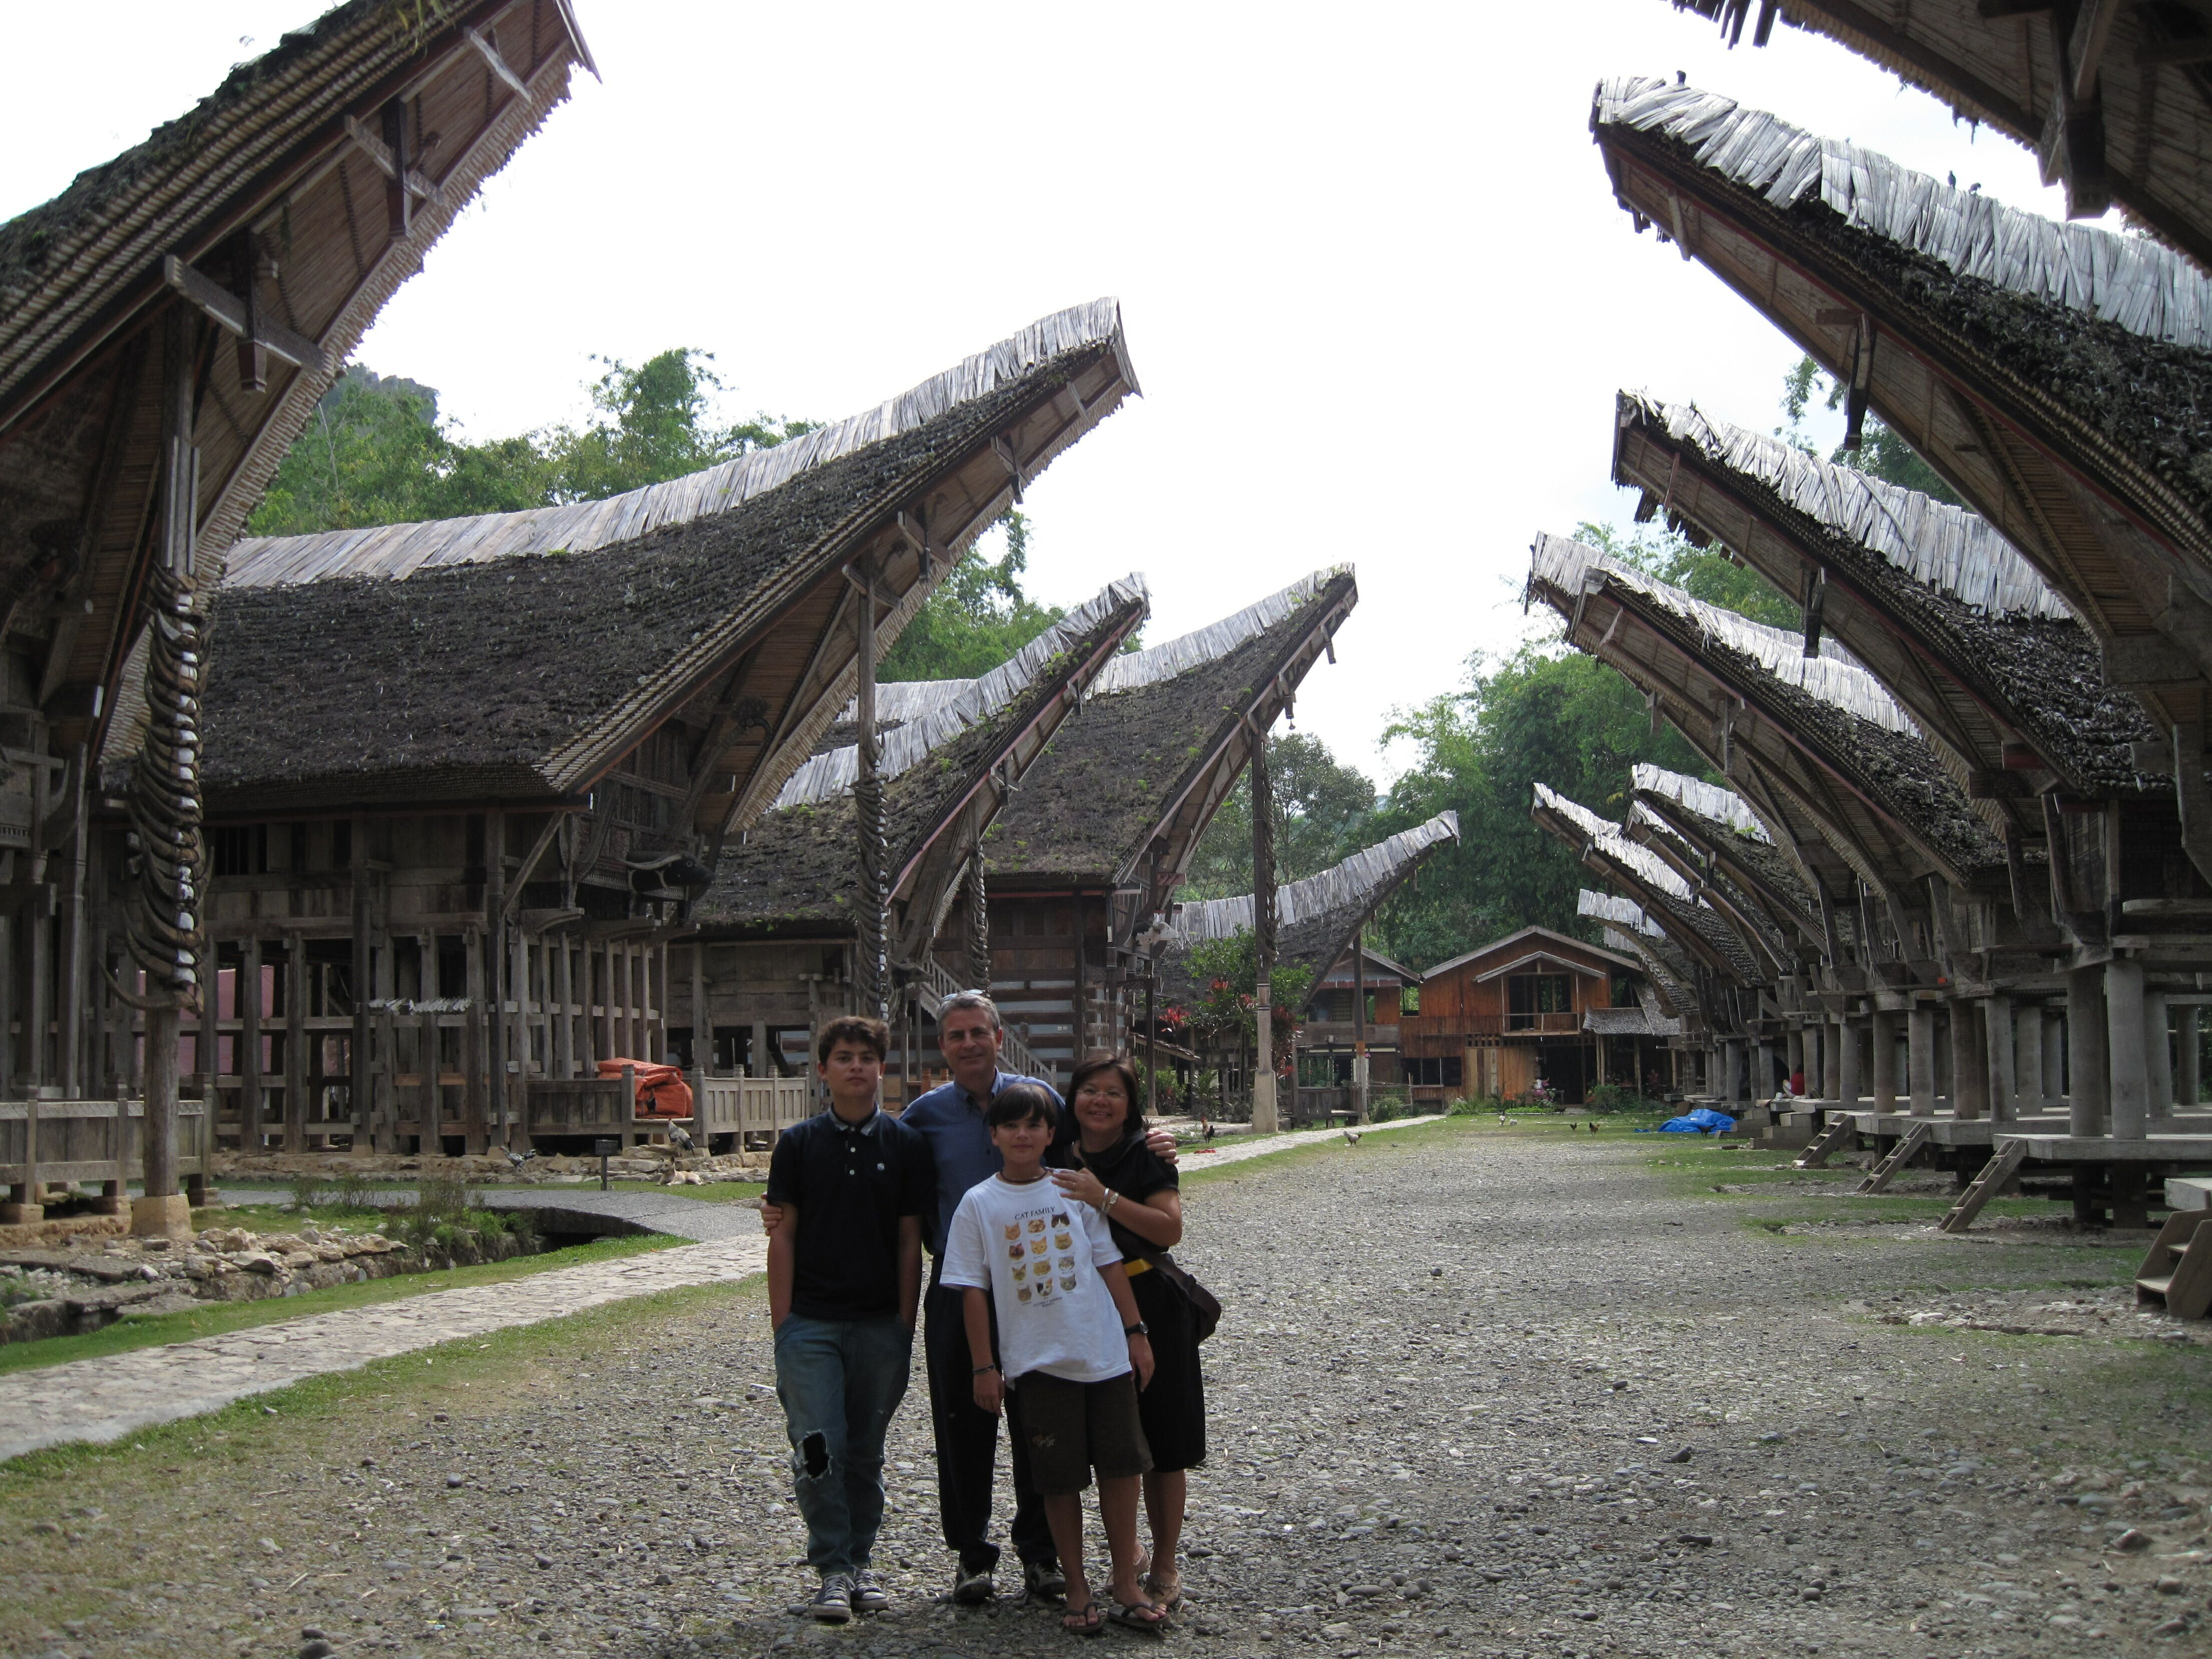 Sulawesi43 1 - Sulawesi Tour 7 Days